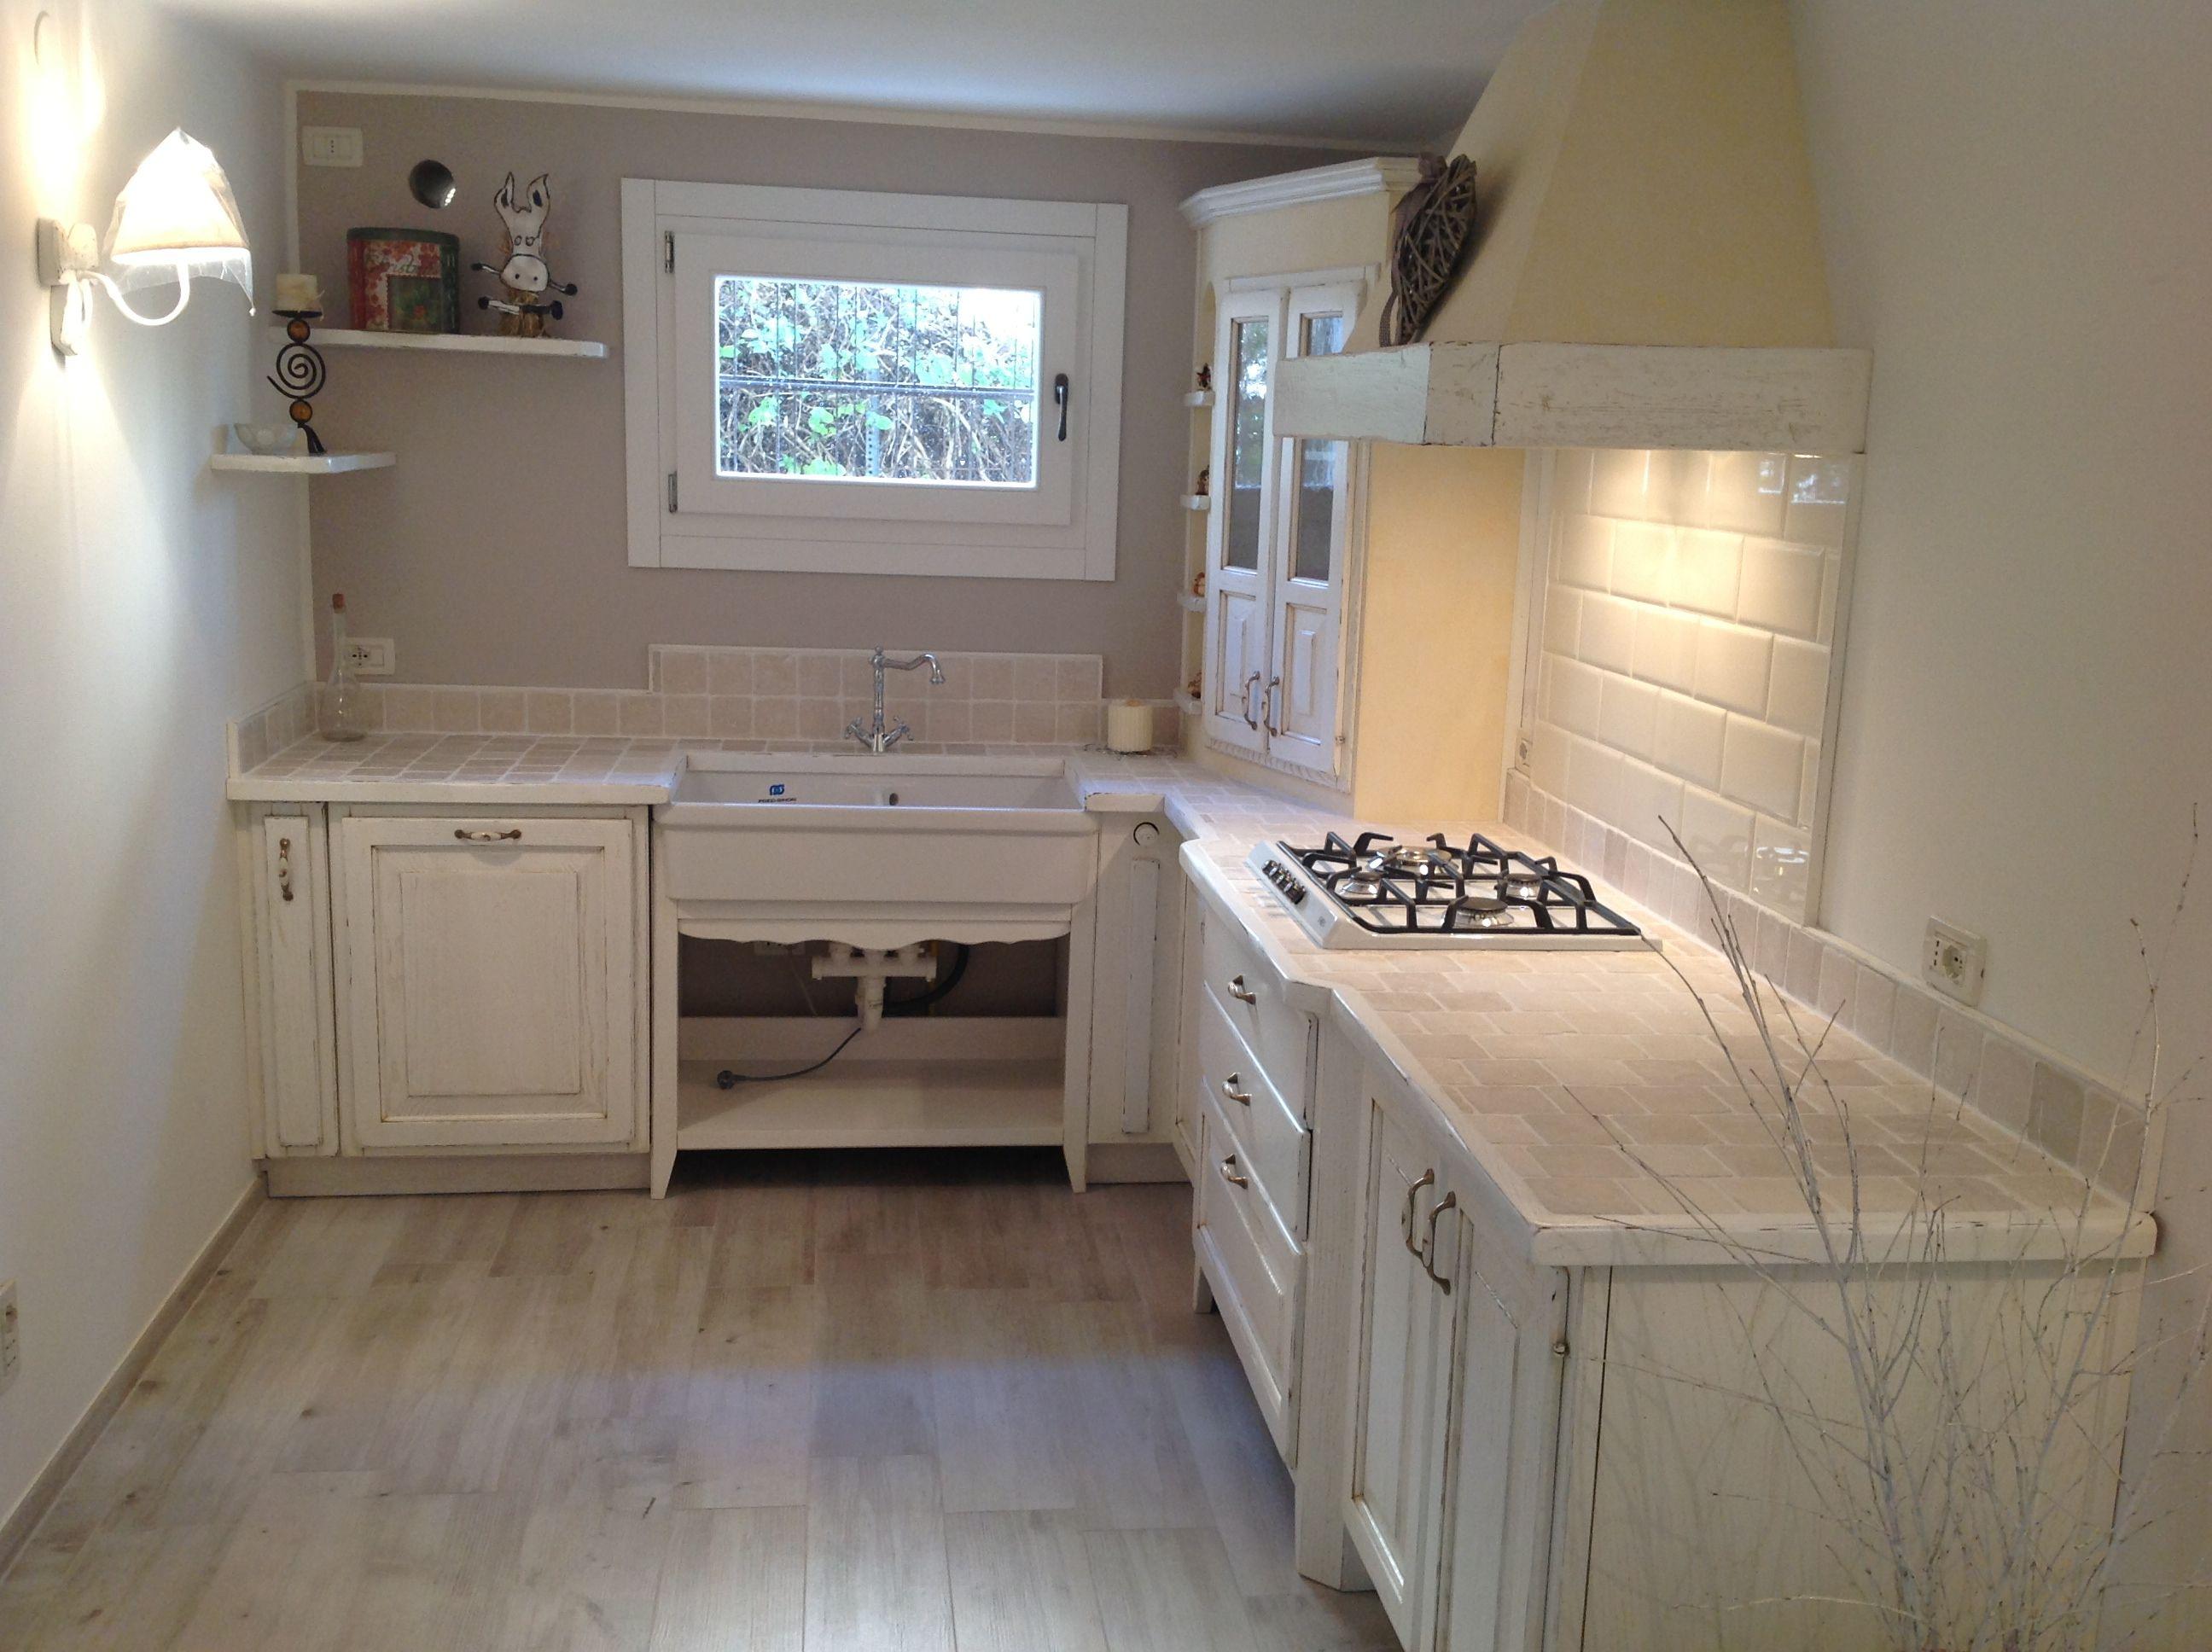 Provenzale Arredamento ~ Cucina in muratura in stile provenzale home sweet home